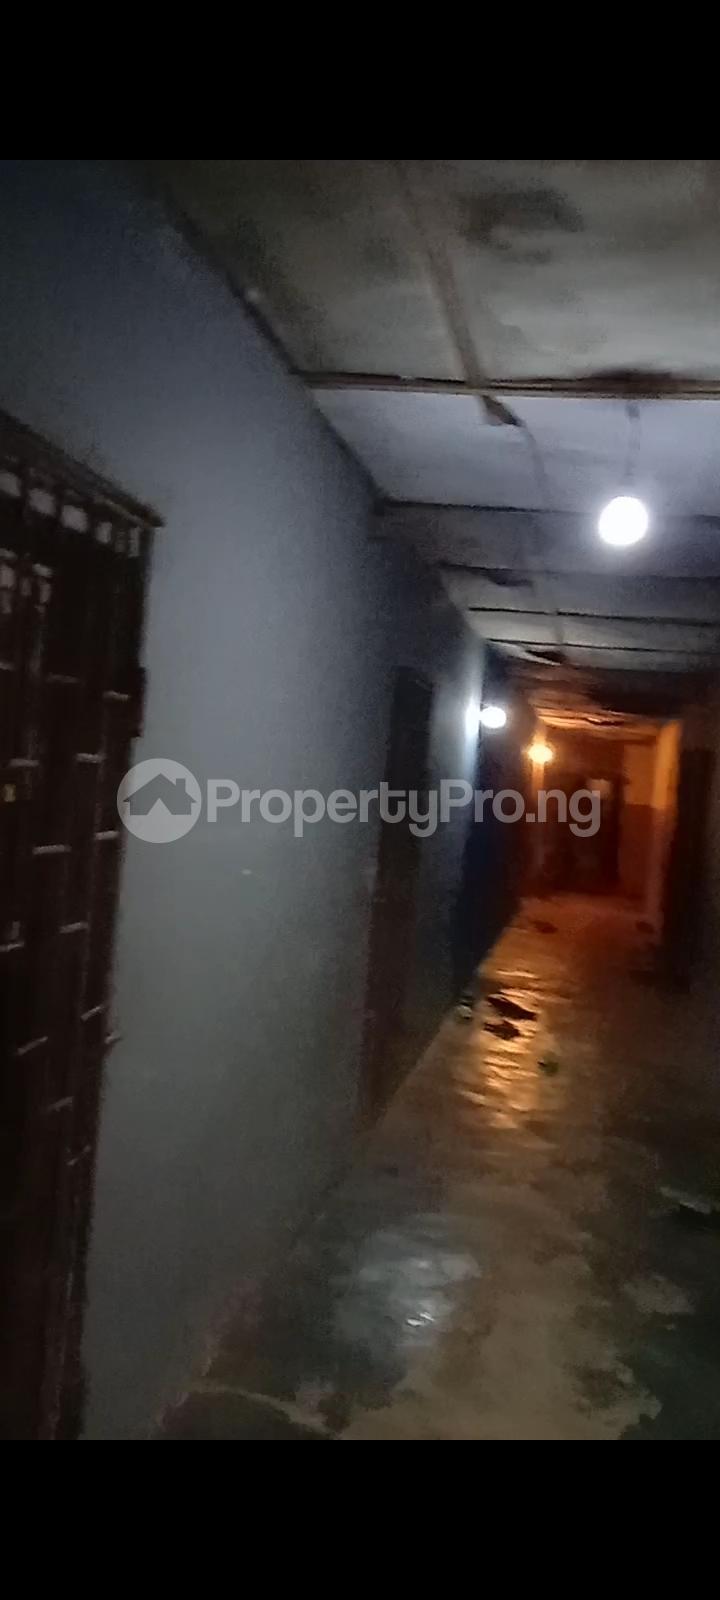 10 bedroom Detached Bungalow for sale Off Olanrewaju Street Akesan Isheri Igando Lasu Rd Akesan Alimosho Lagos - 1